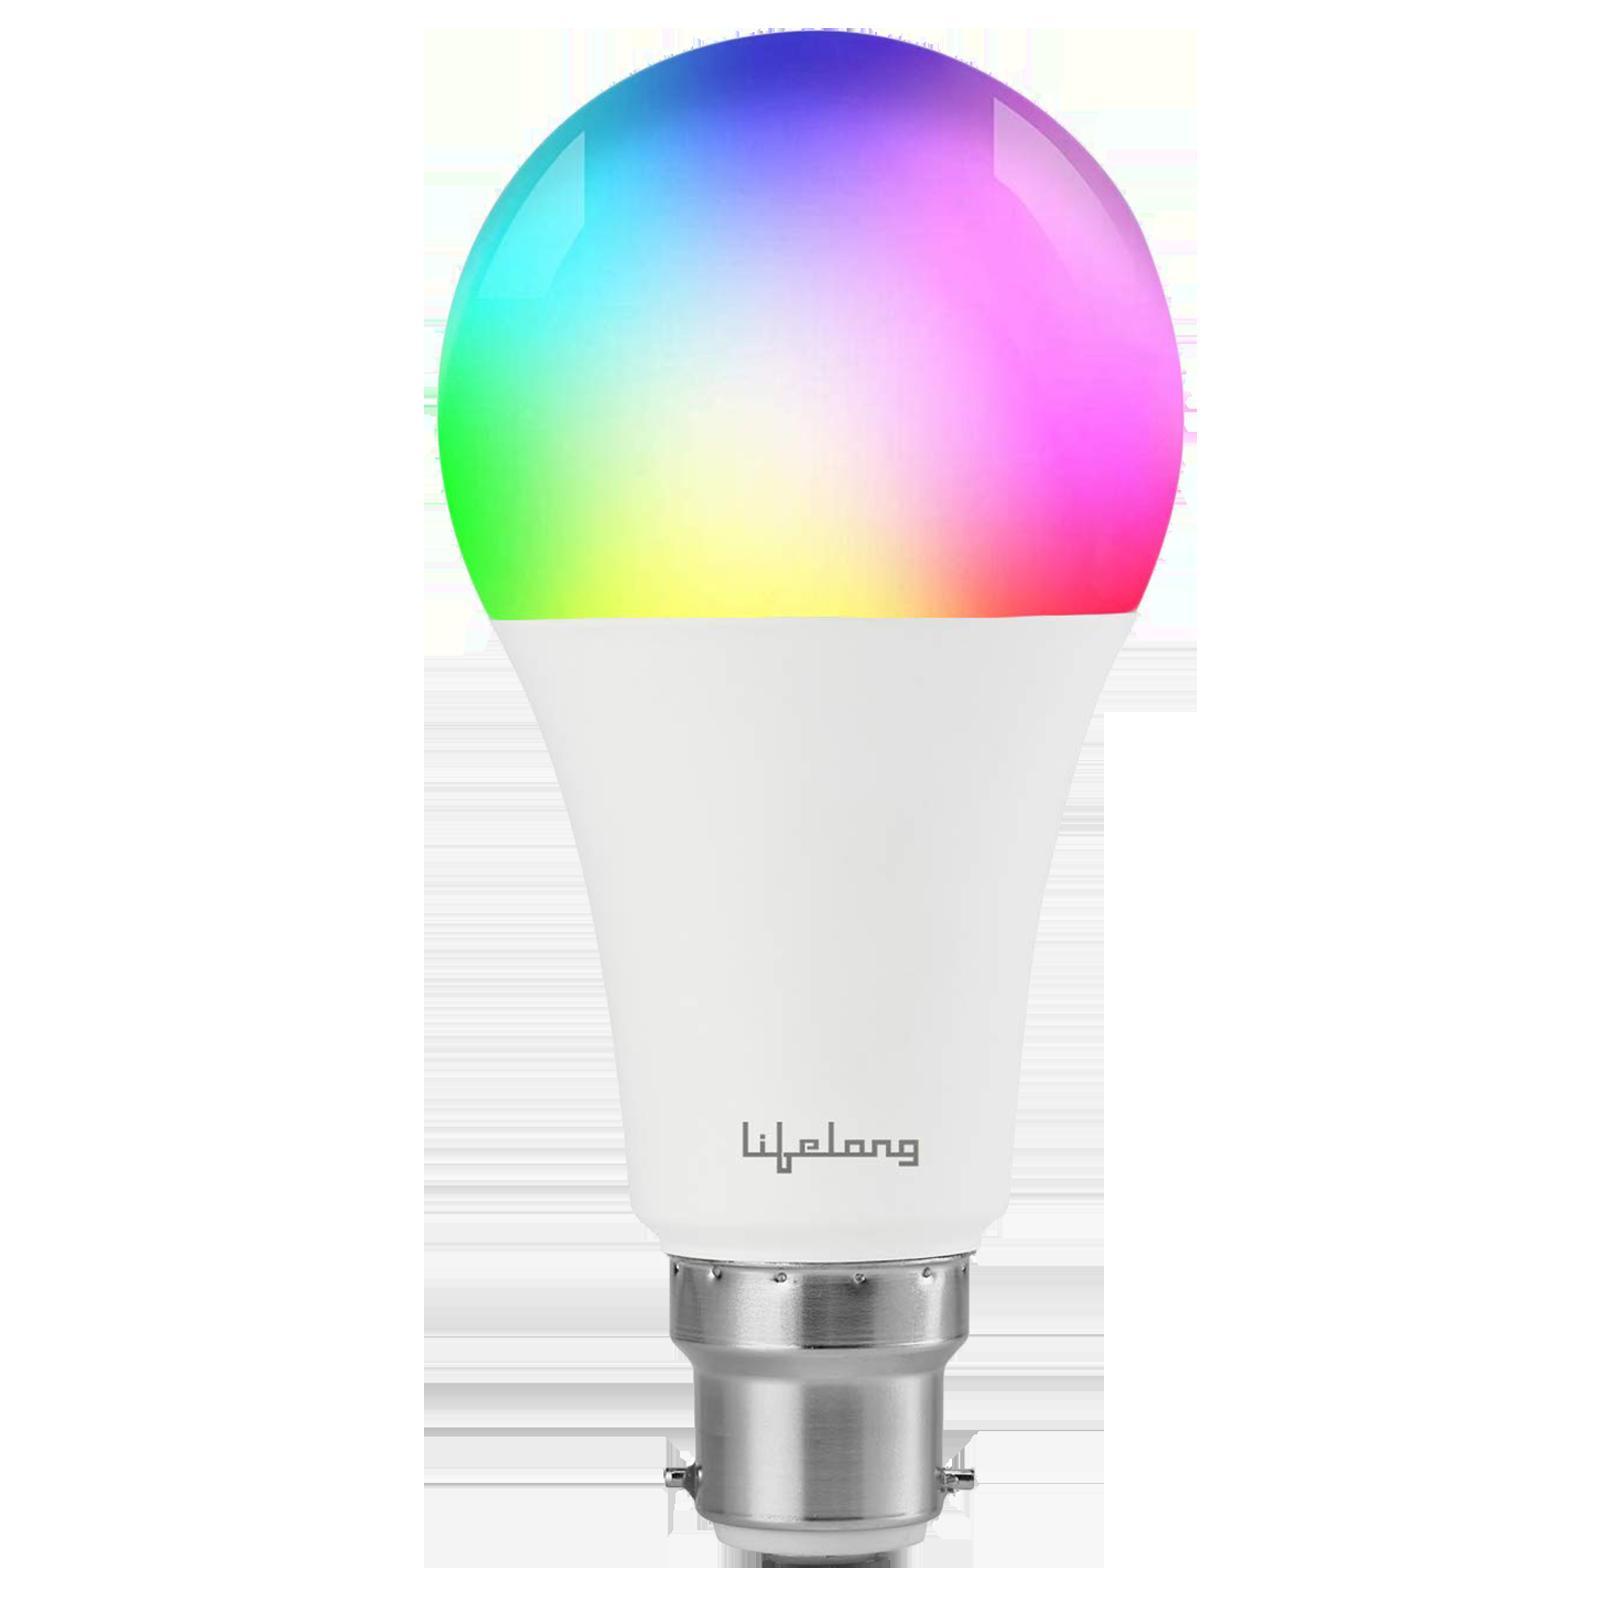 Lifelong 12 Watts Electric Powered LED Bulb (1080 Lumens, LLSB12W, Multicolor)_1